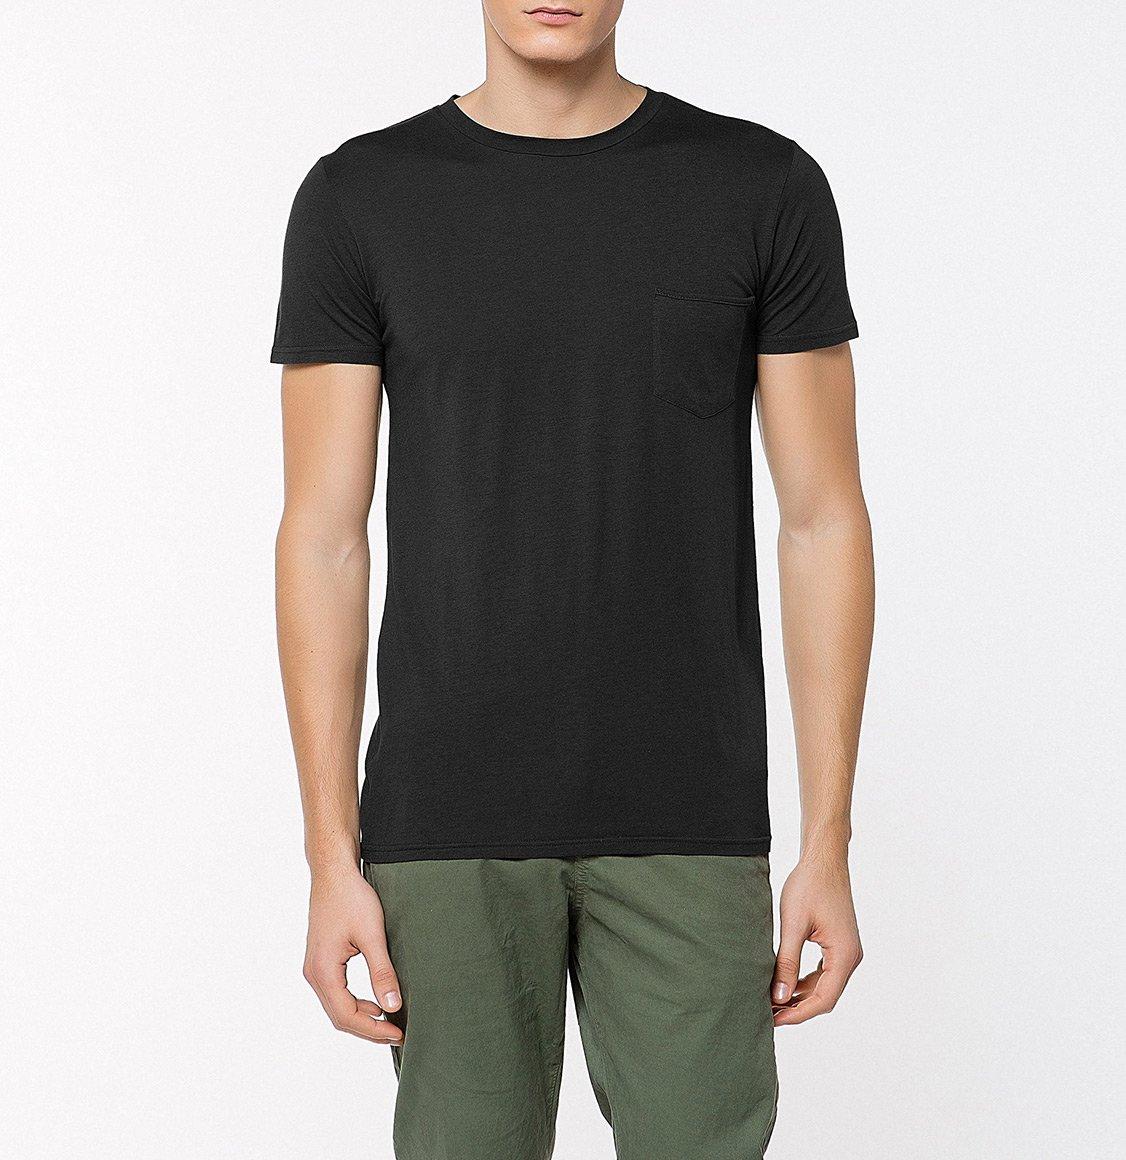 The Project Garments Crew Neck Modal-Blend Pocket T-shirt Charcoal Grey